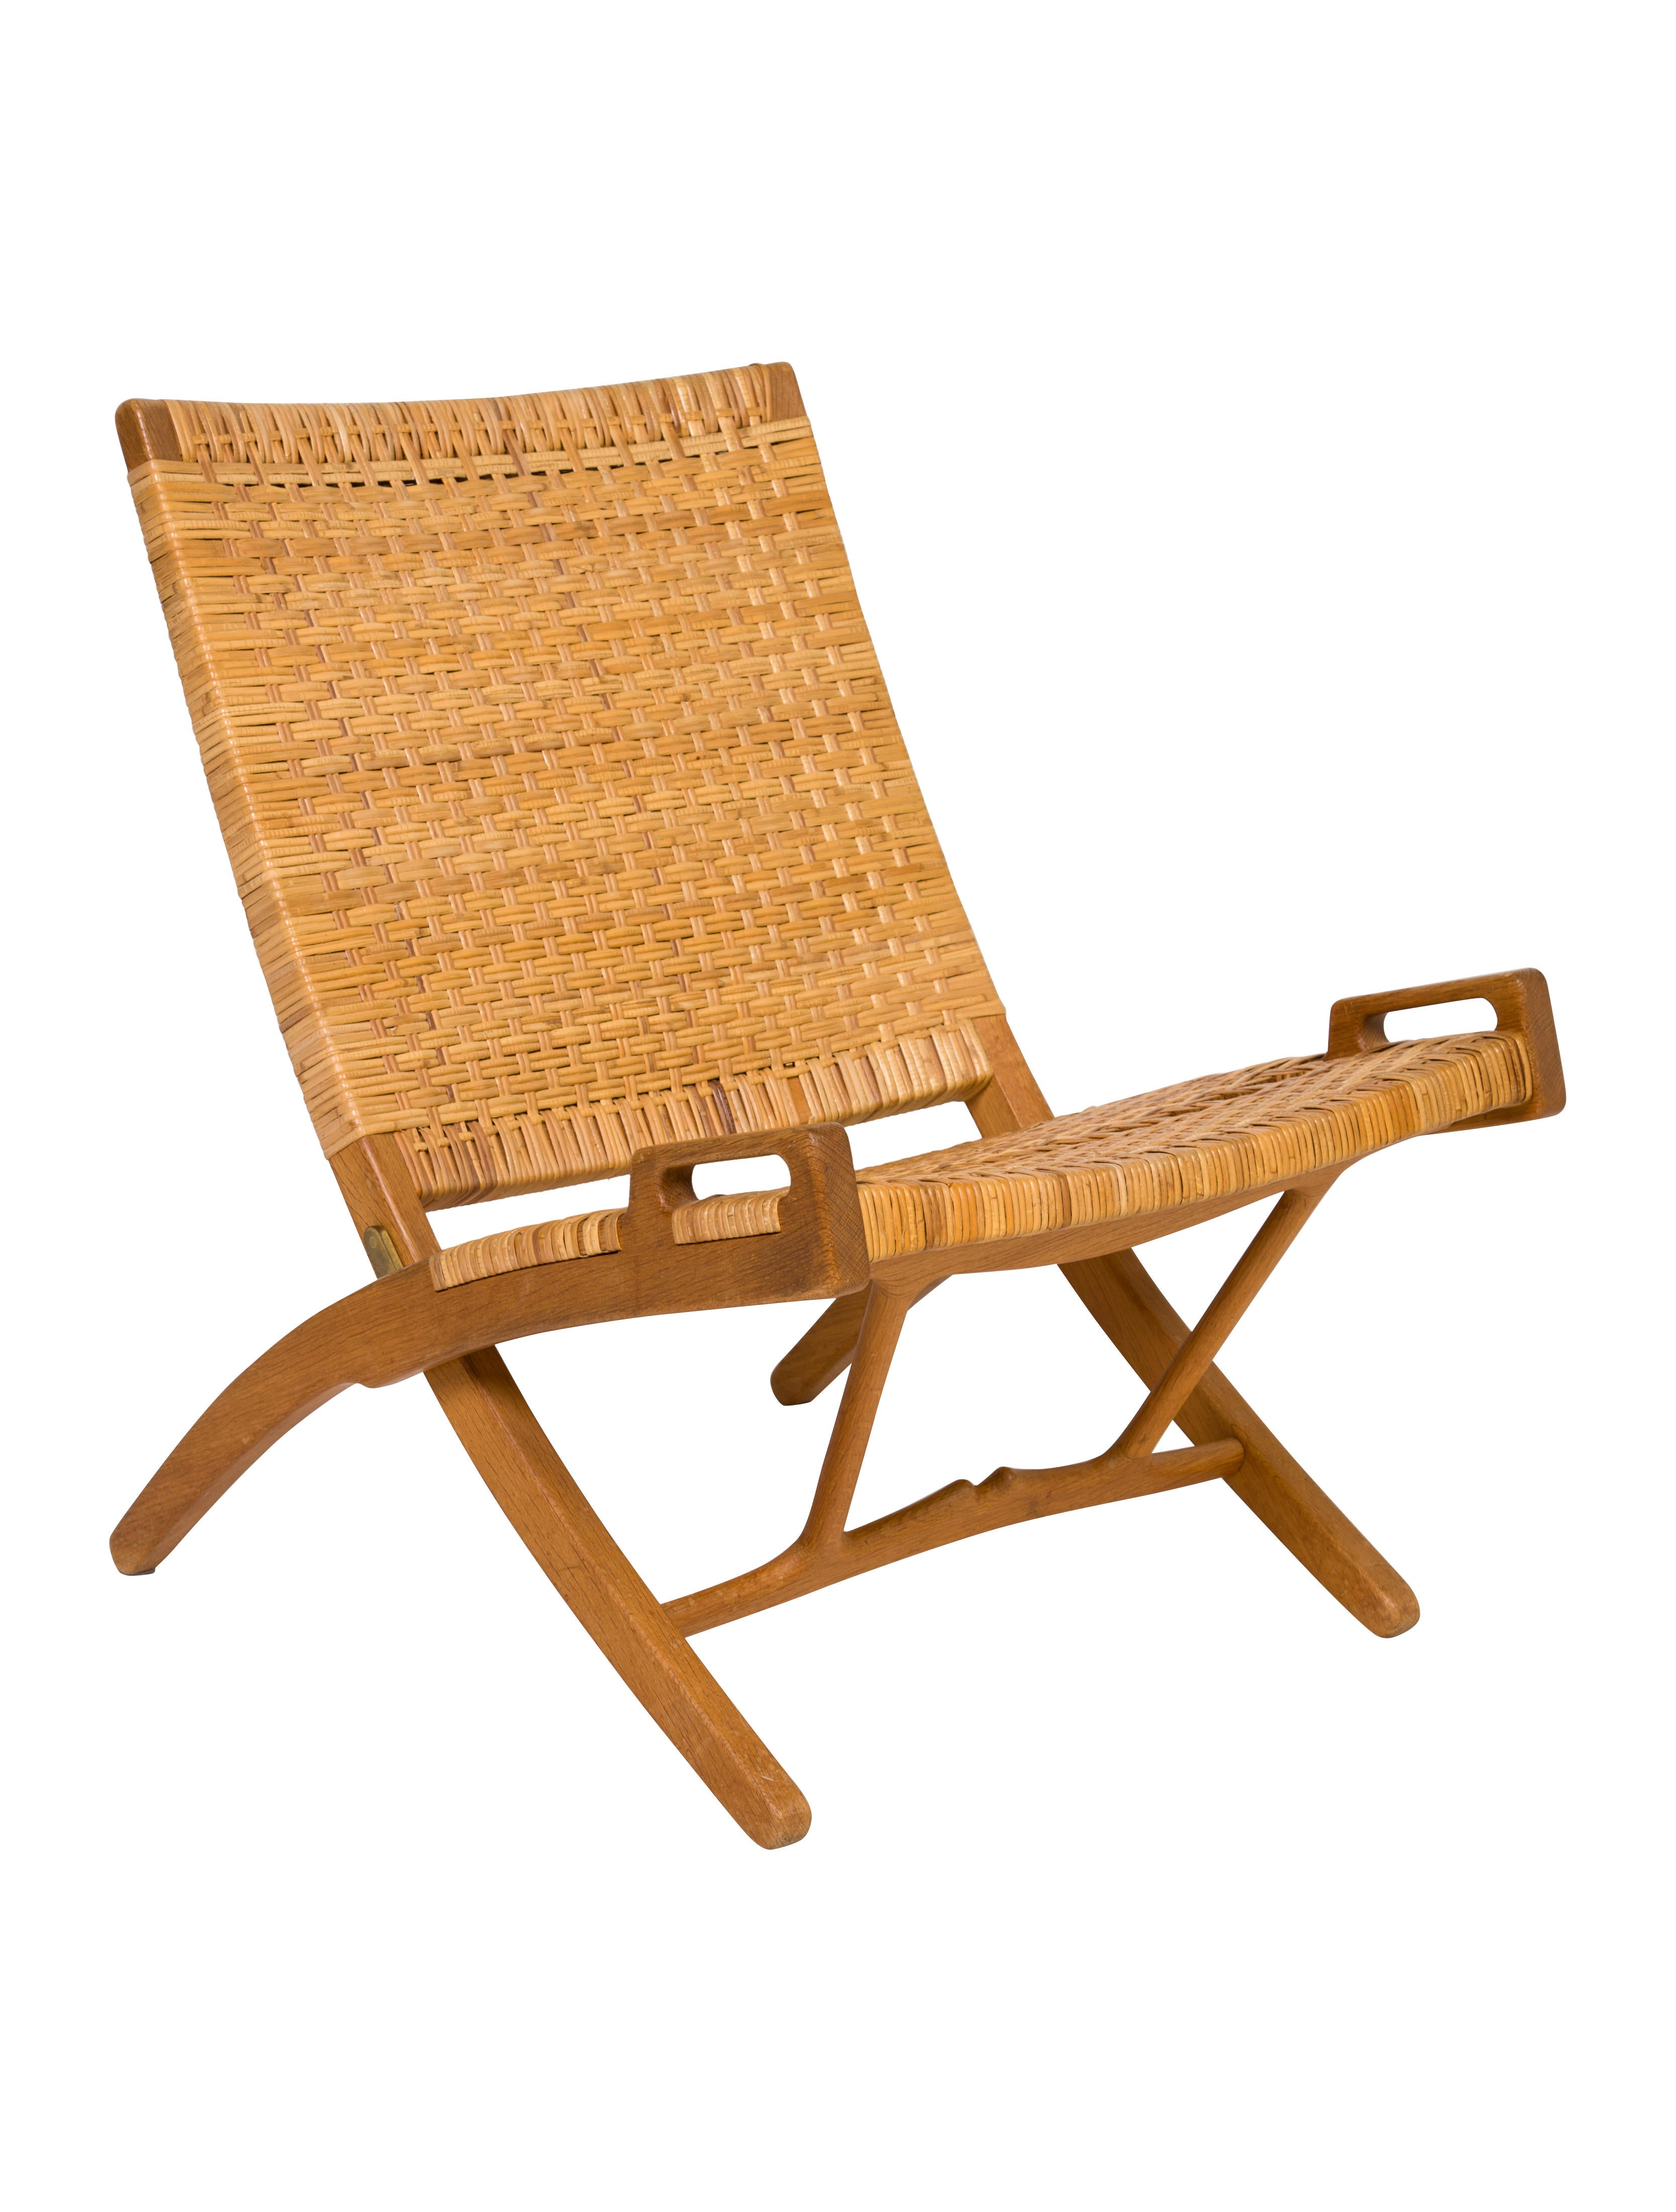 Johannes Hansen Oak Folding Chair  sc 1 st  The RealReal & Hans Wegner Johannes Hansen Oak Folding Chair - Furniture - HWG20006 ...